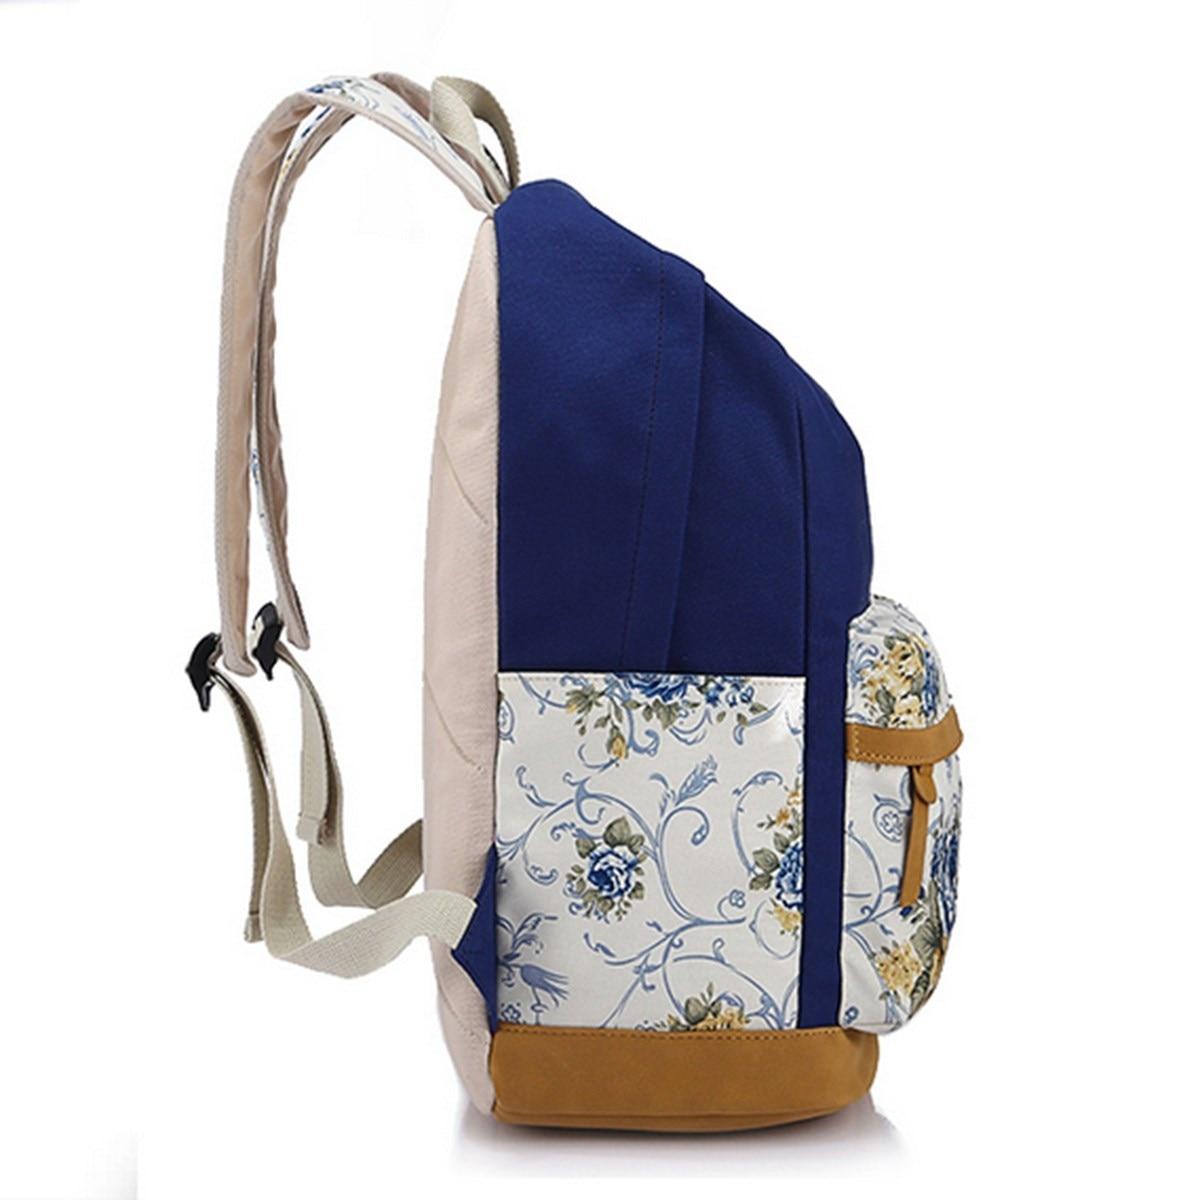 AEQUEEN Canvas Women Backpacks Girls School Bag Floral Korean ...